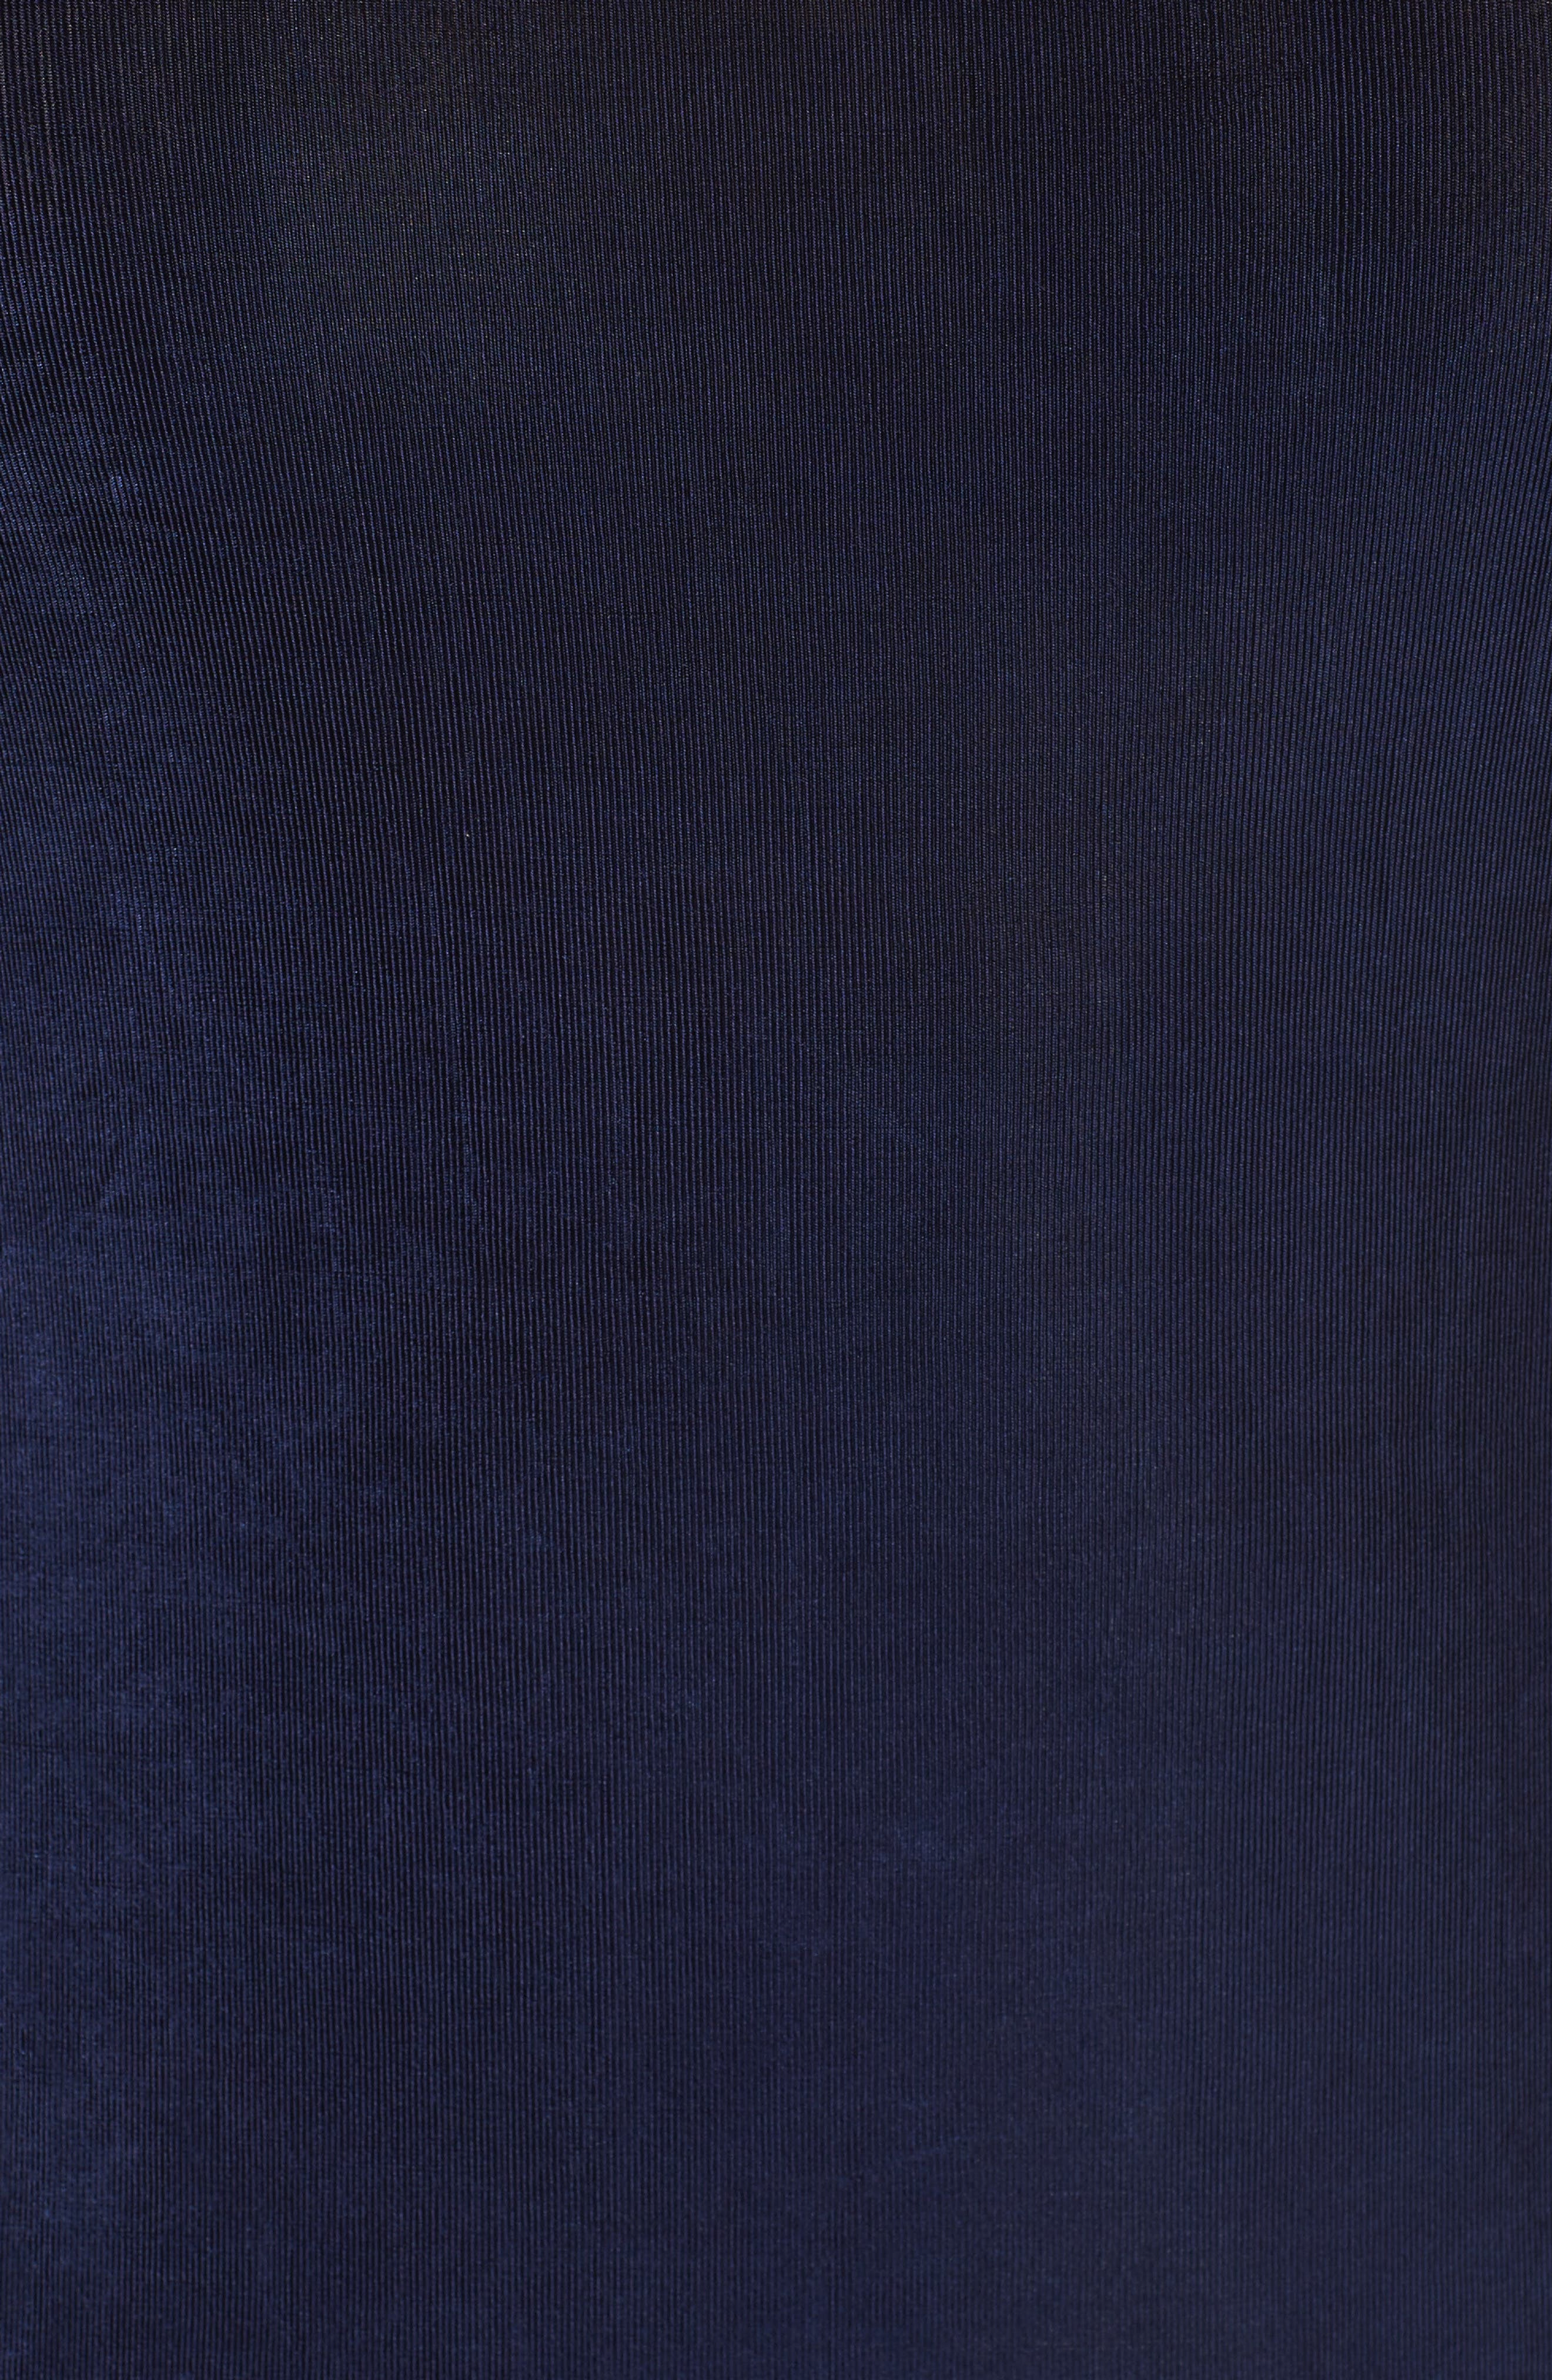 VIKKI VI,                             Sleeveless Maxi Tank Dress,                             Alternate thumbnail 5, color,                             NAVY